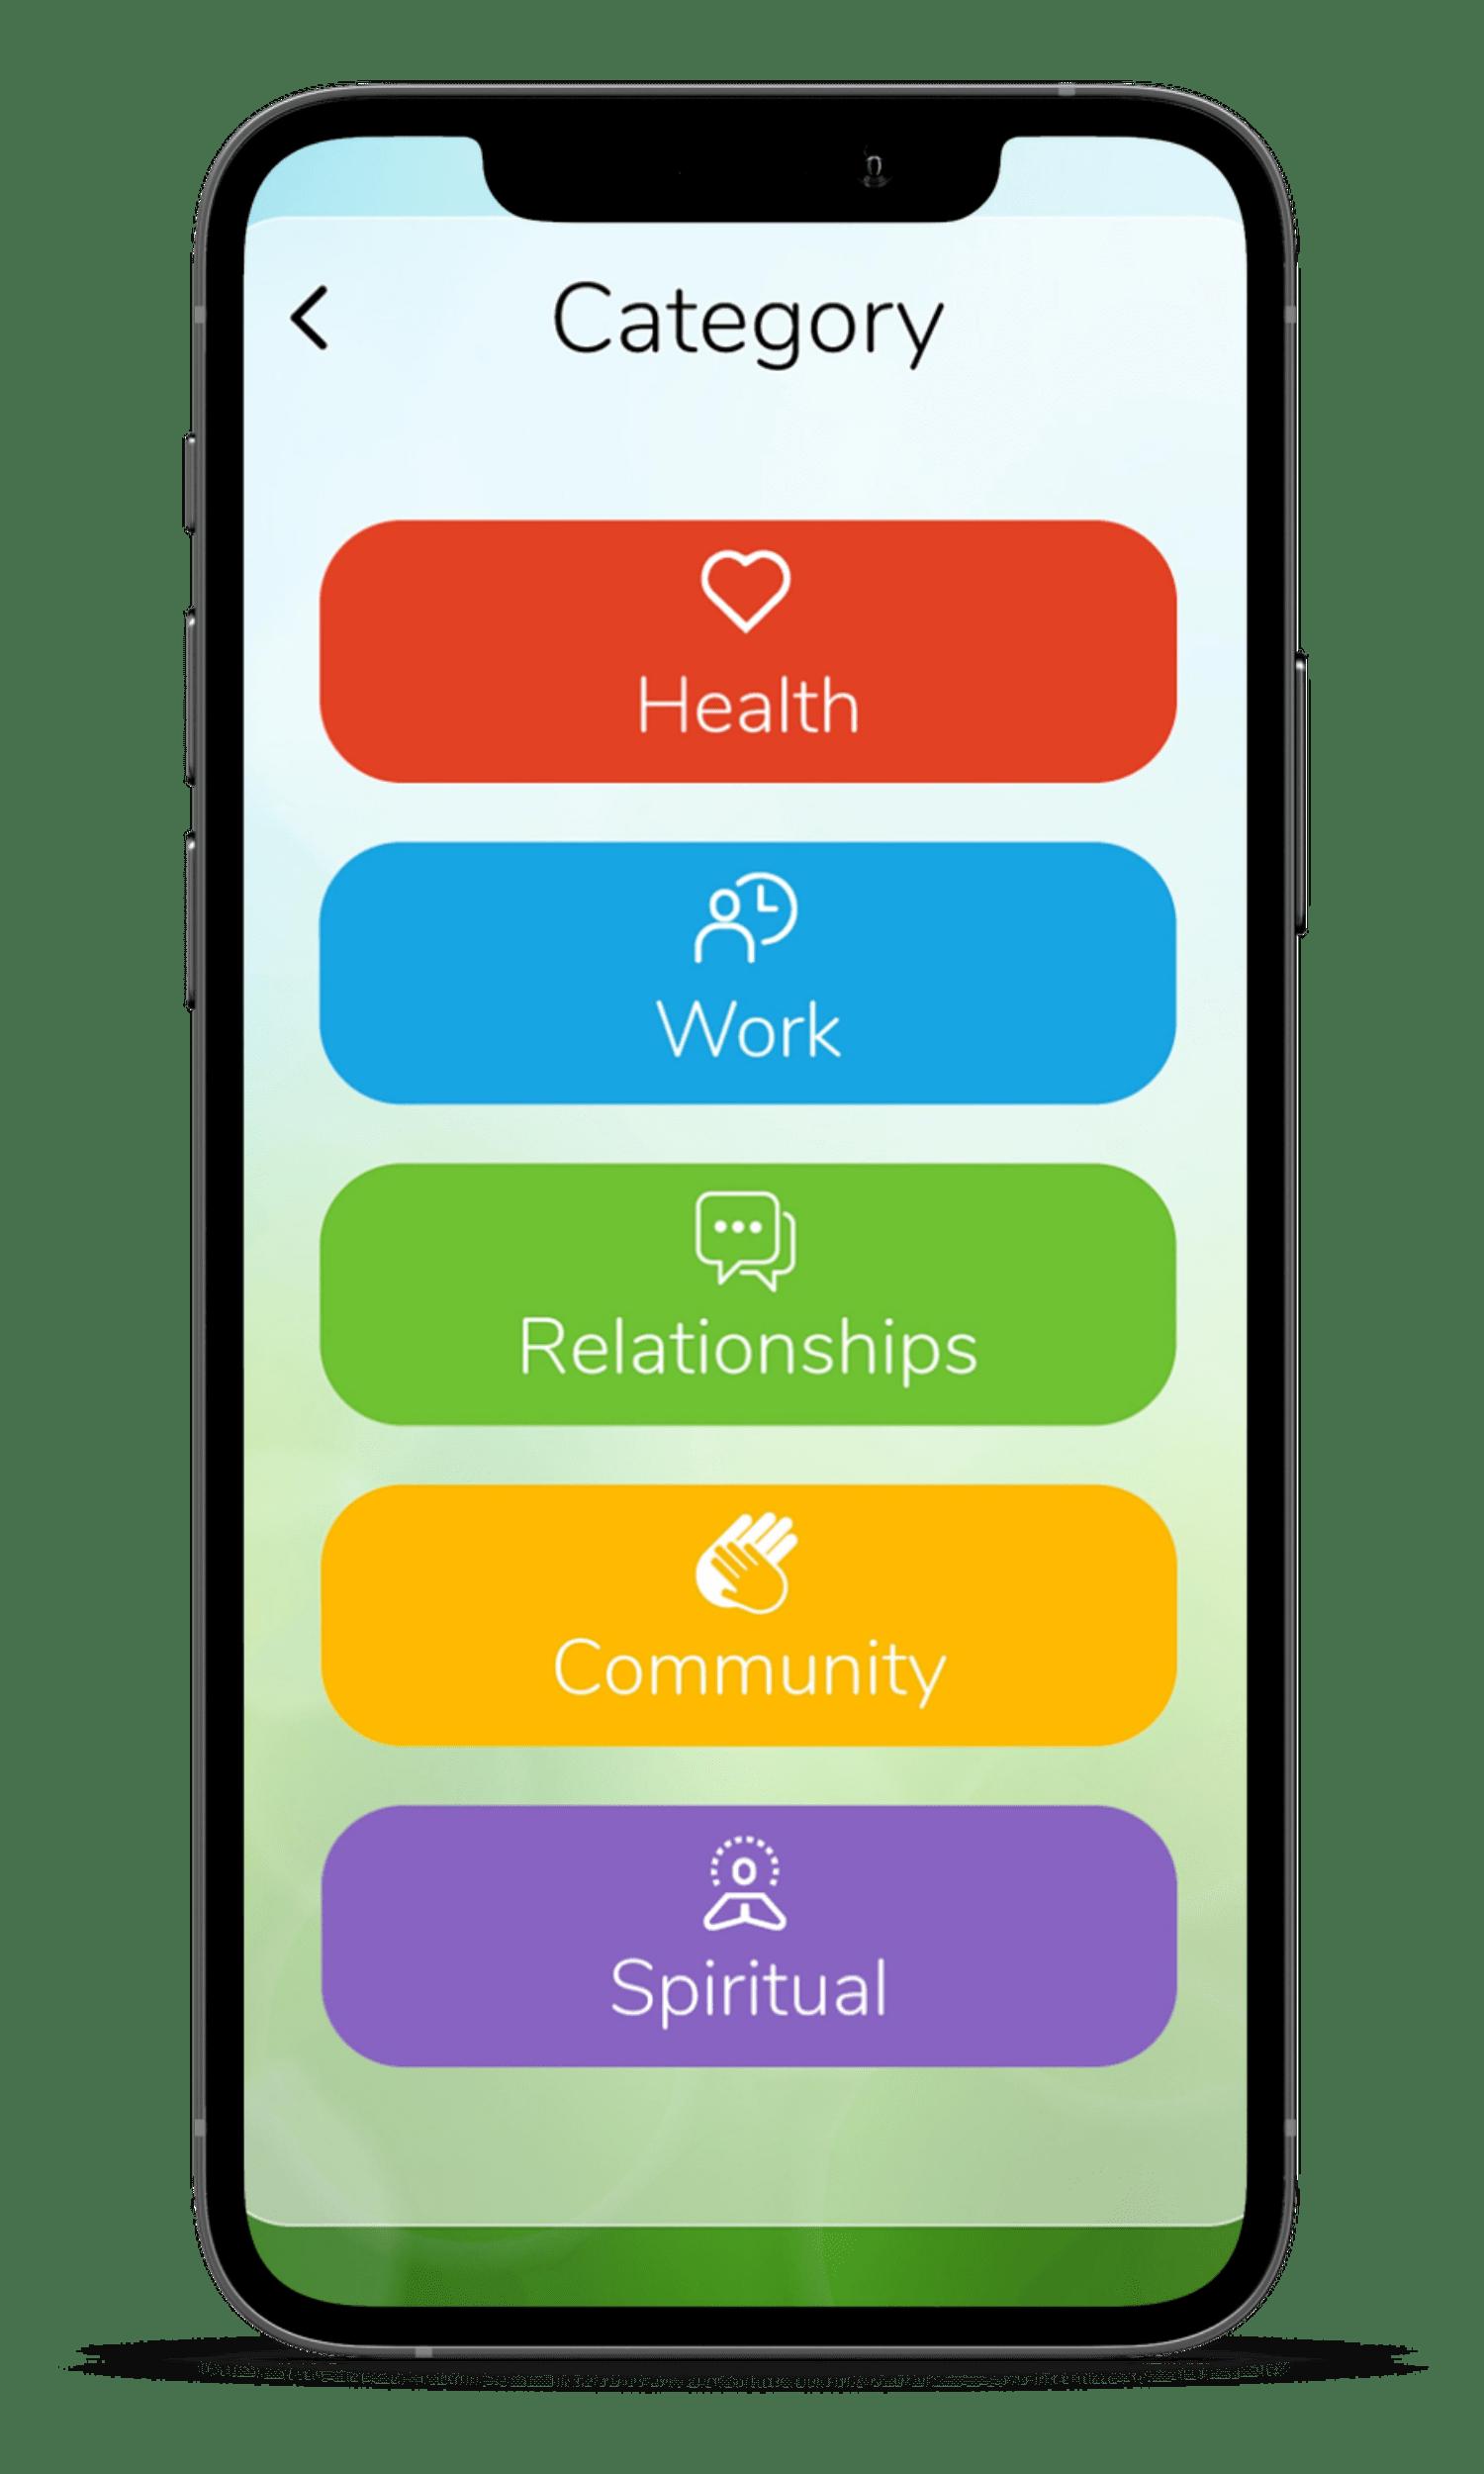 Gadjet App Hero Image - Goal Setting Categories